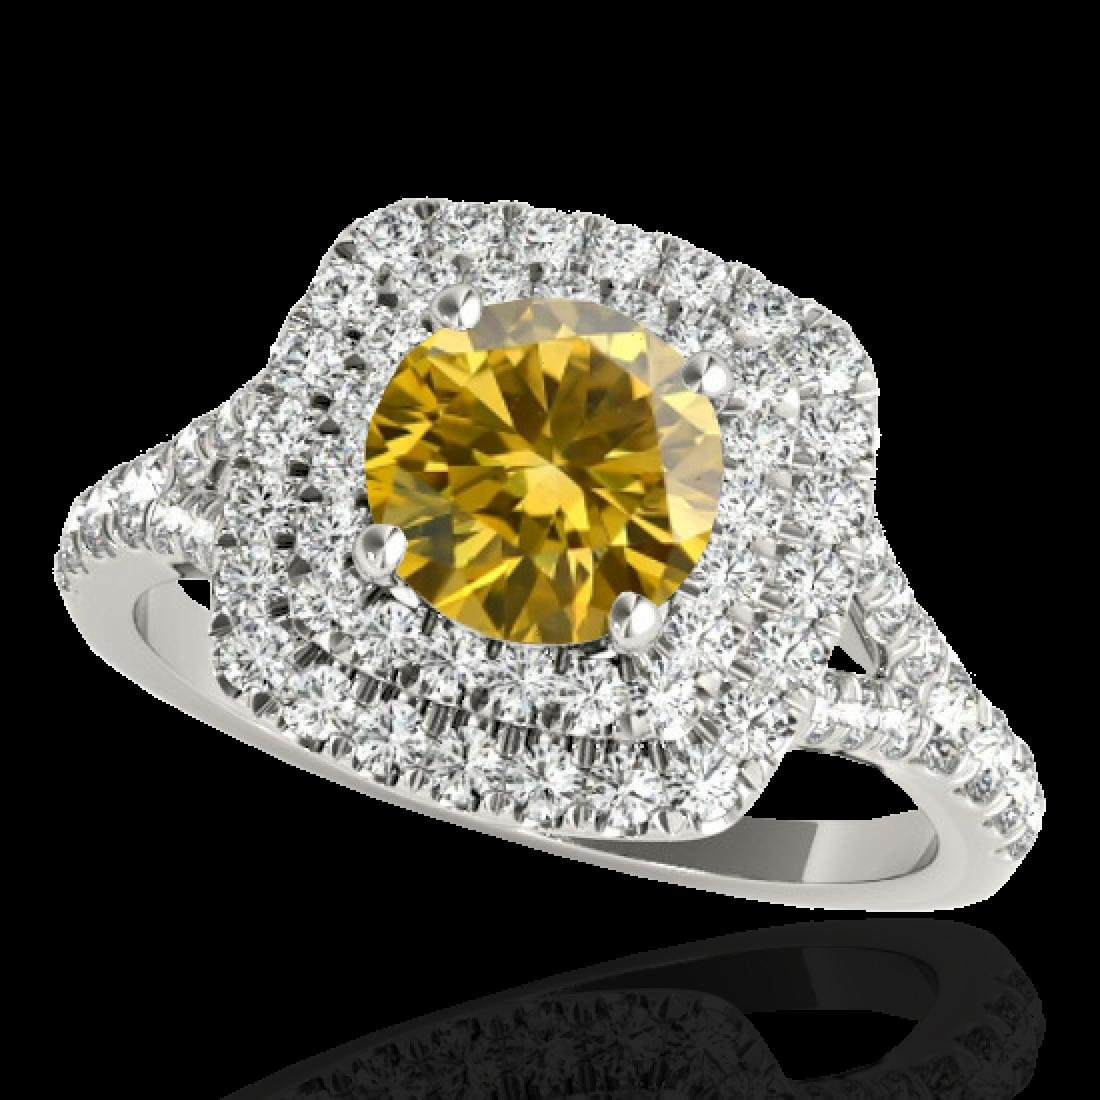 1.6 CTW Certified Si Fancy Intense Diamond Solitaire